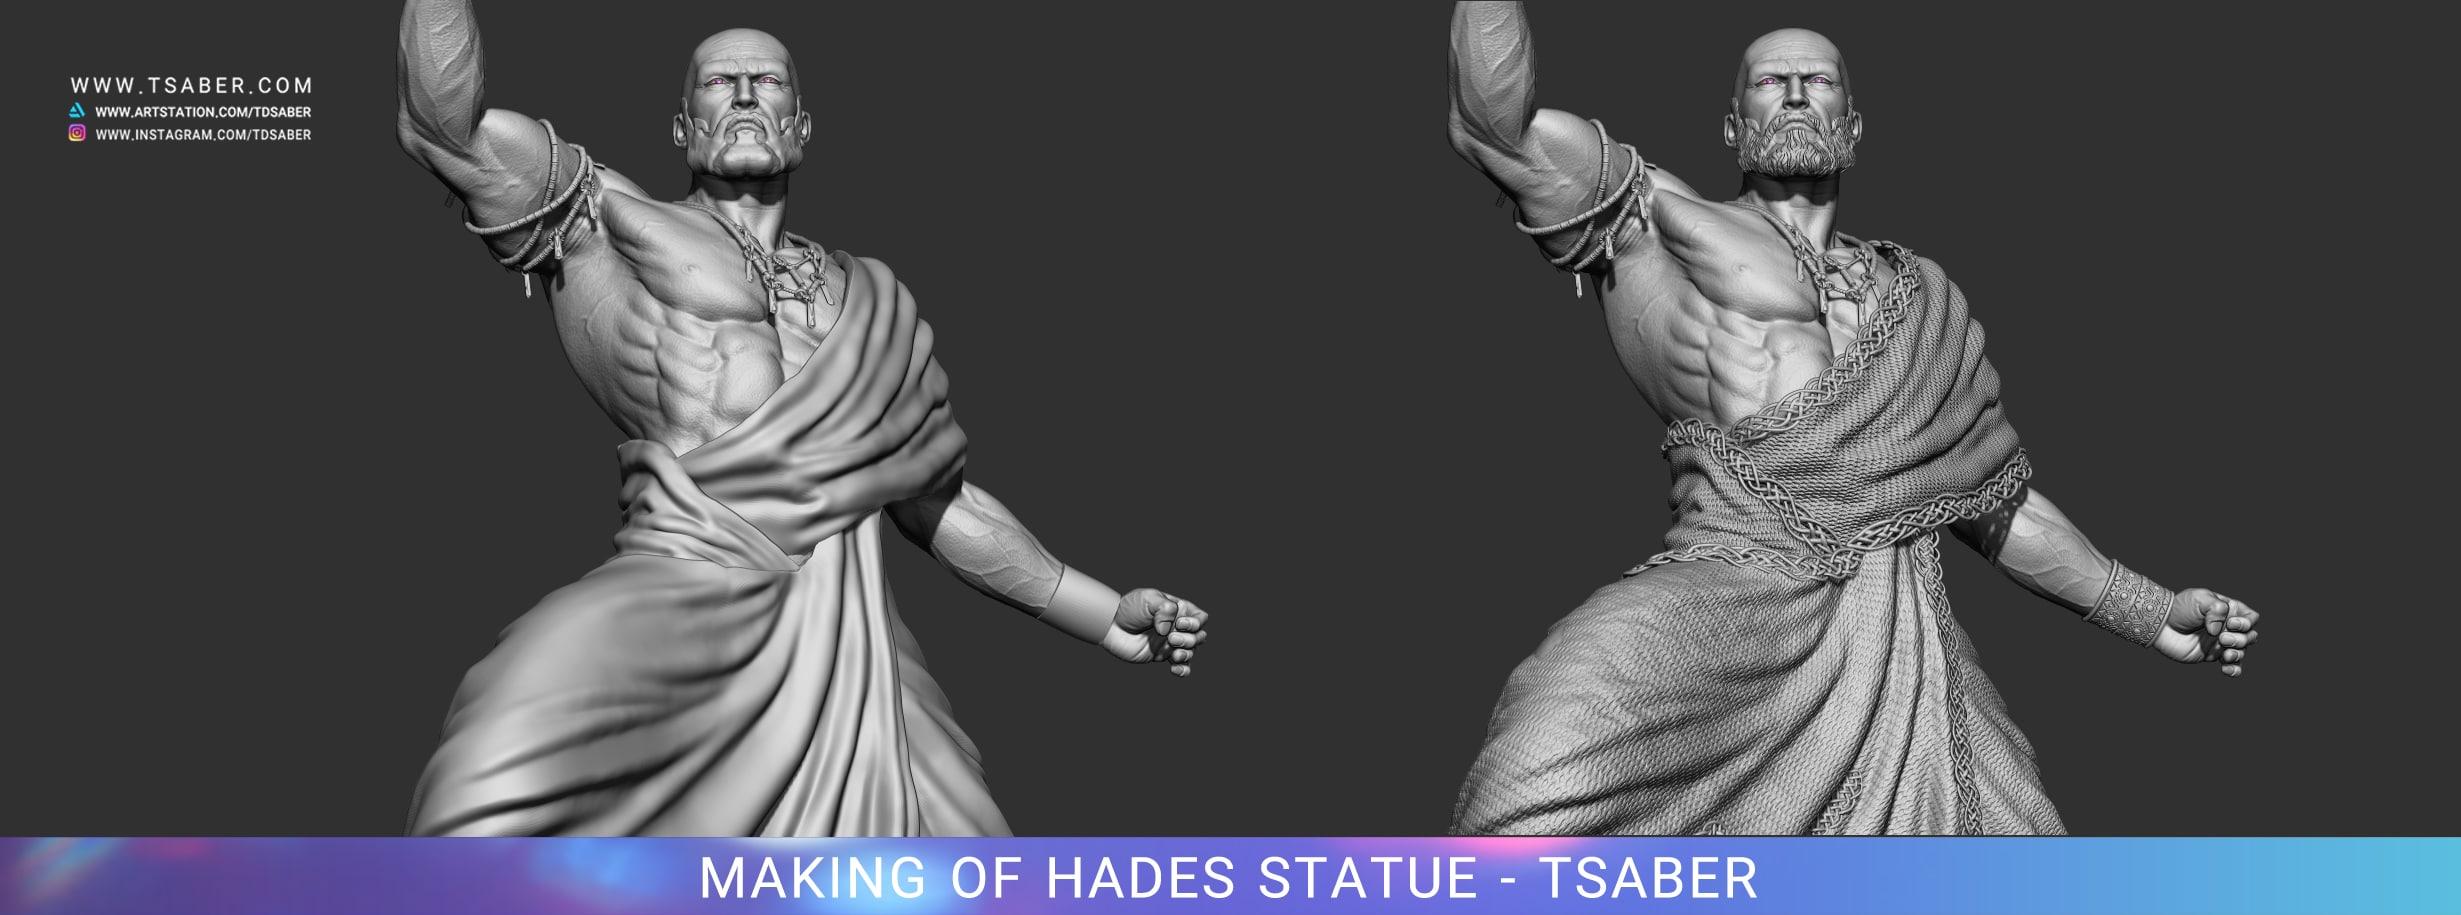 Making of Hades Statue Zbrush - Blood of Zeus - Tsaber